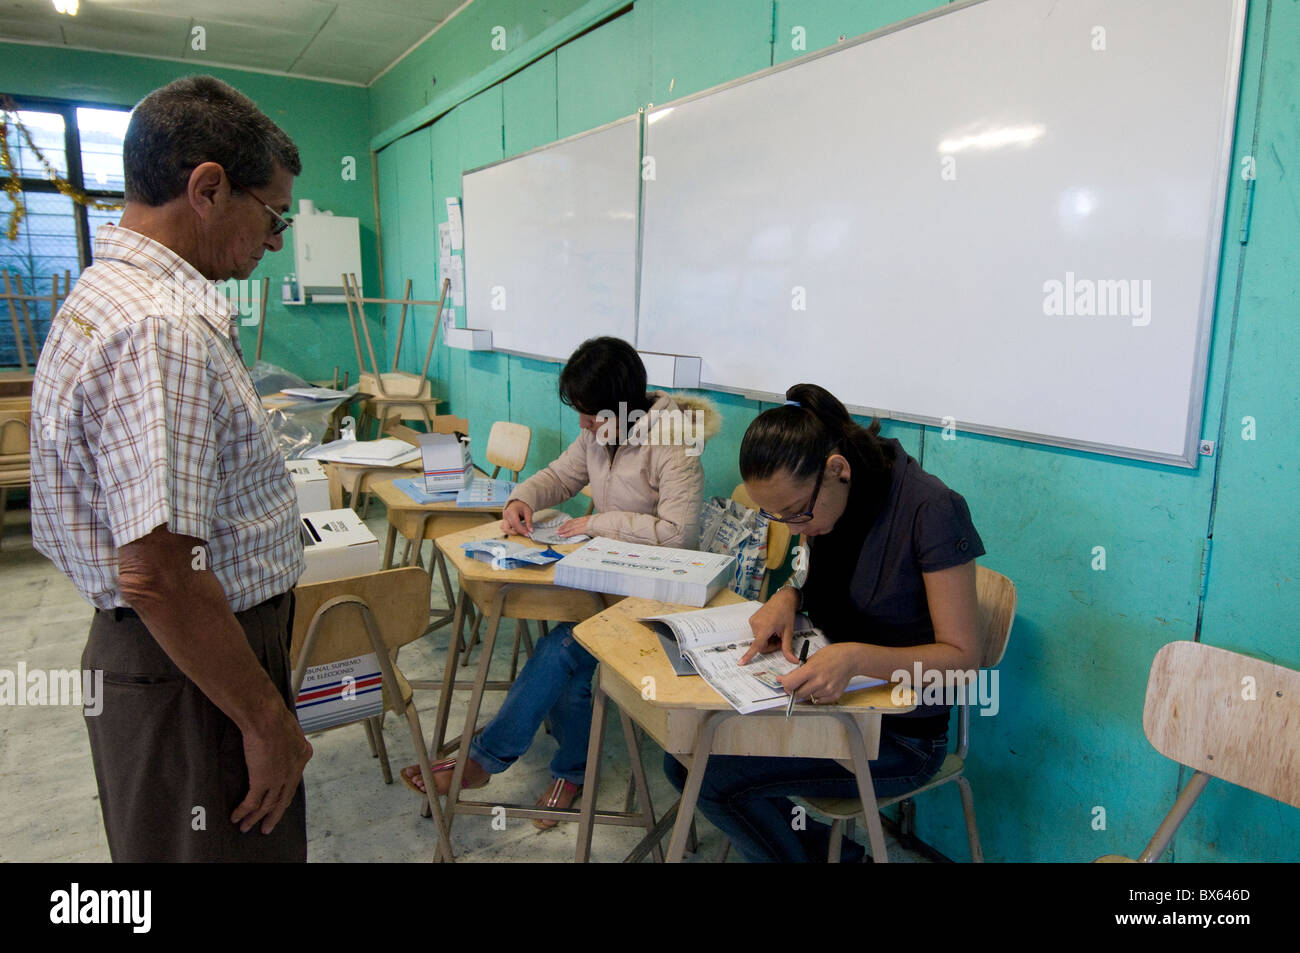 Voter Municipal elections San José Costa Rica - Stock Image